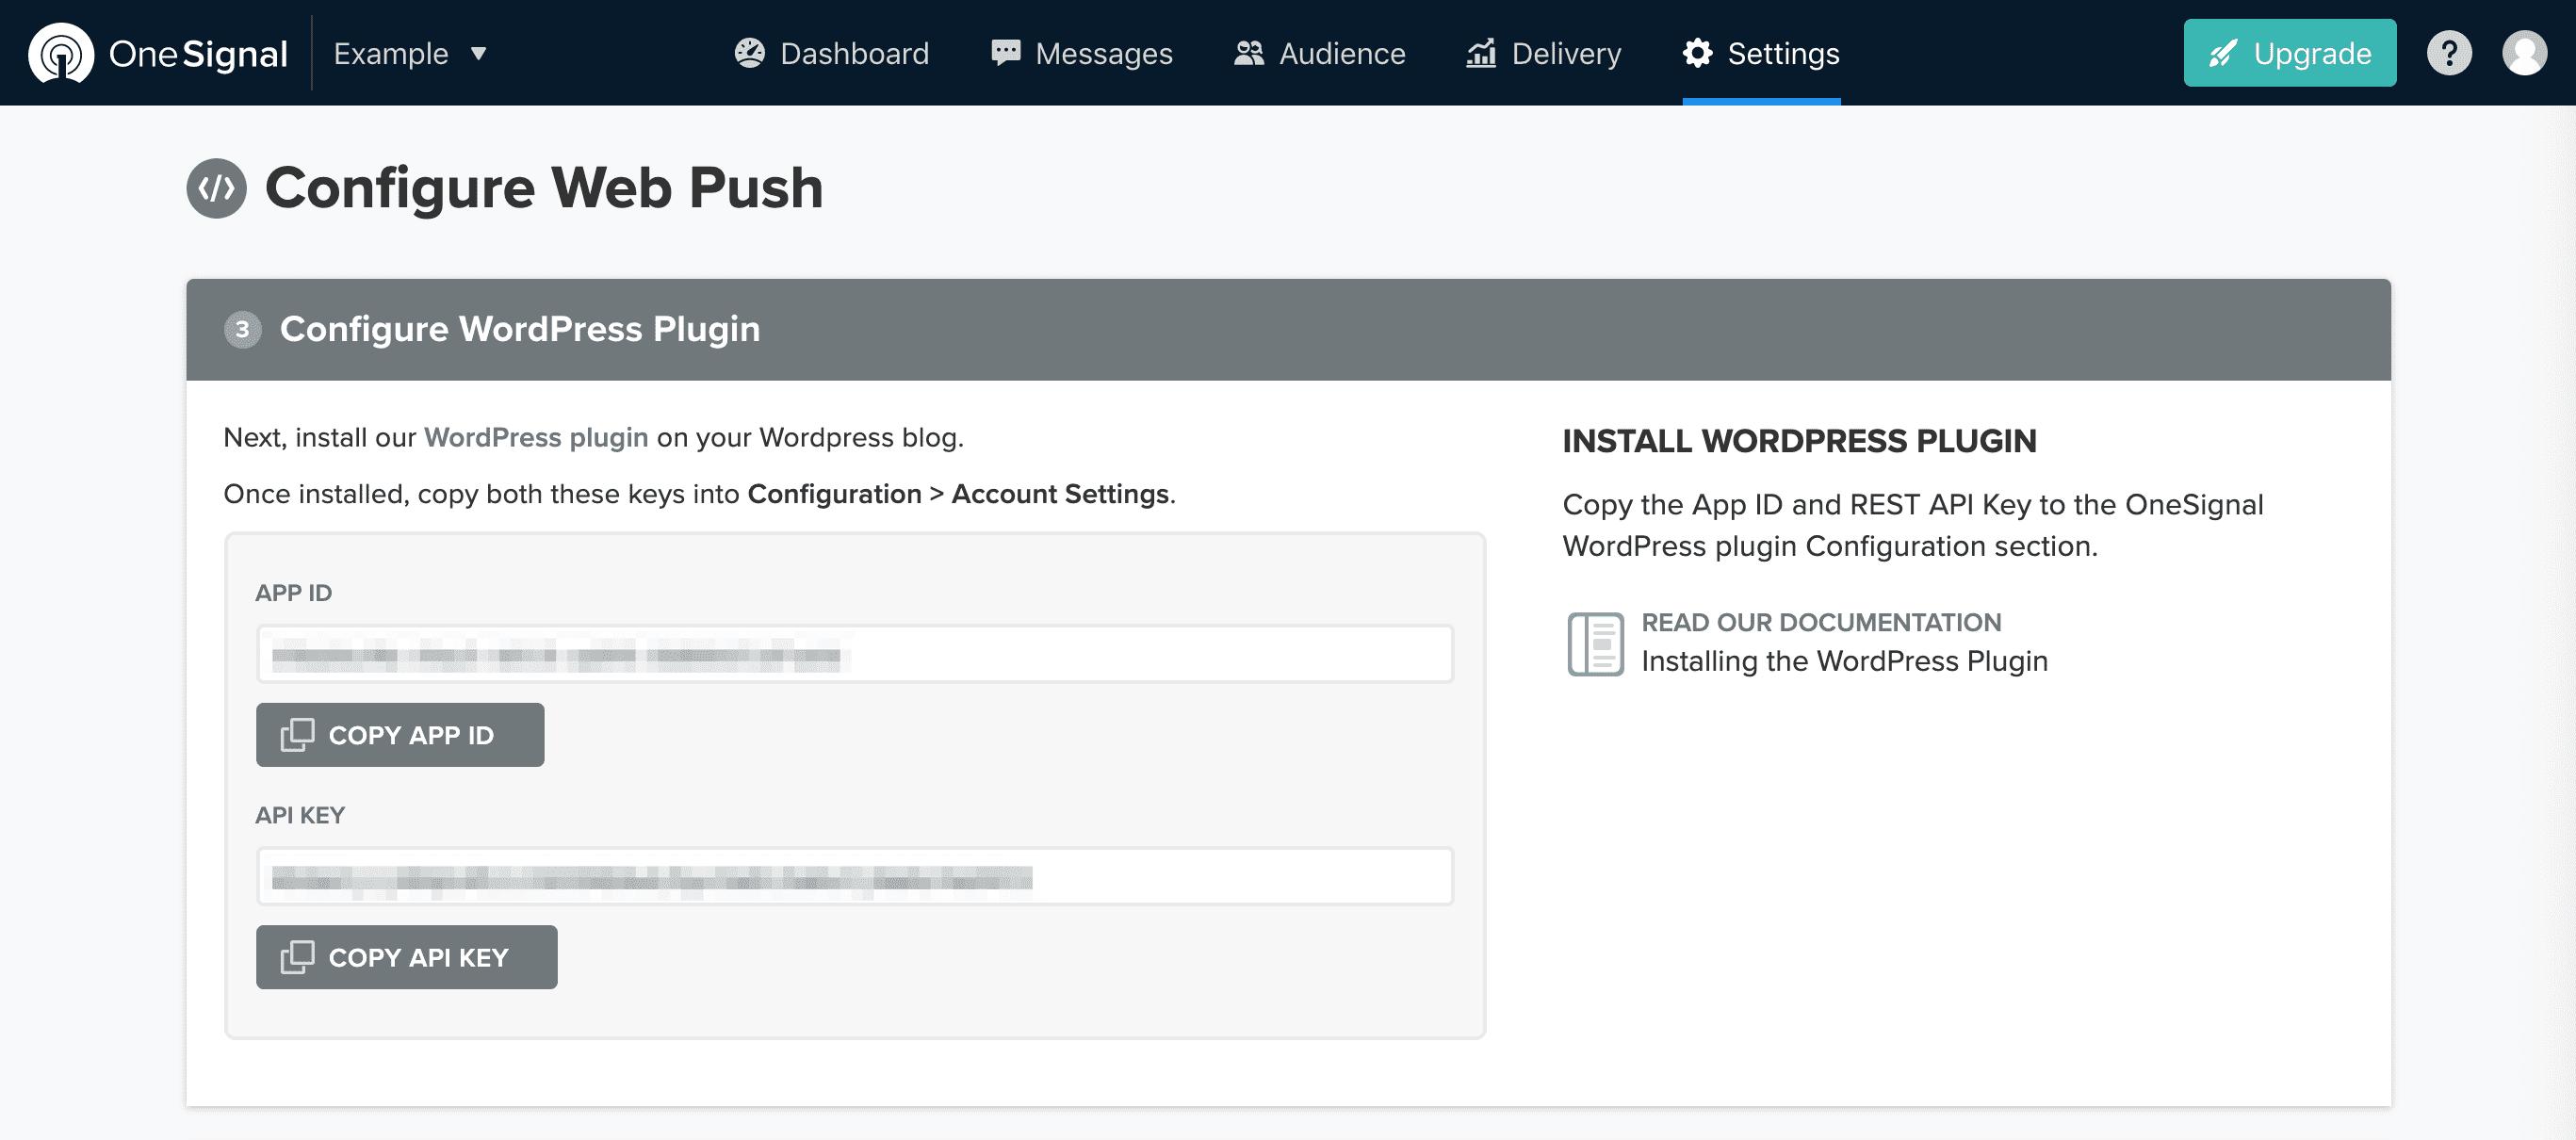 Receiving the OneSignal App ID and API key.